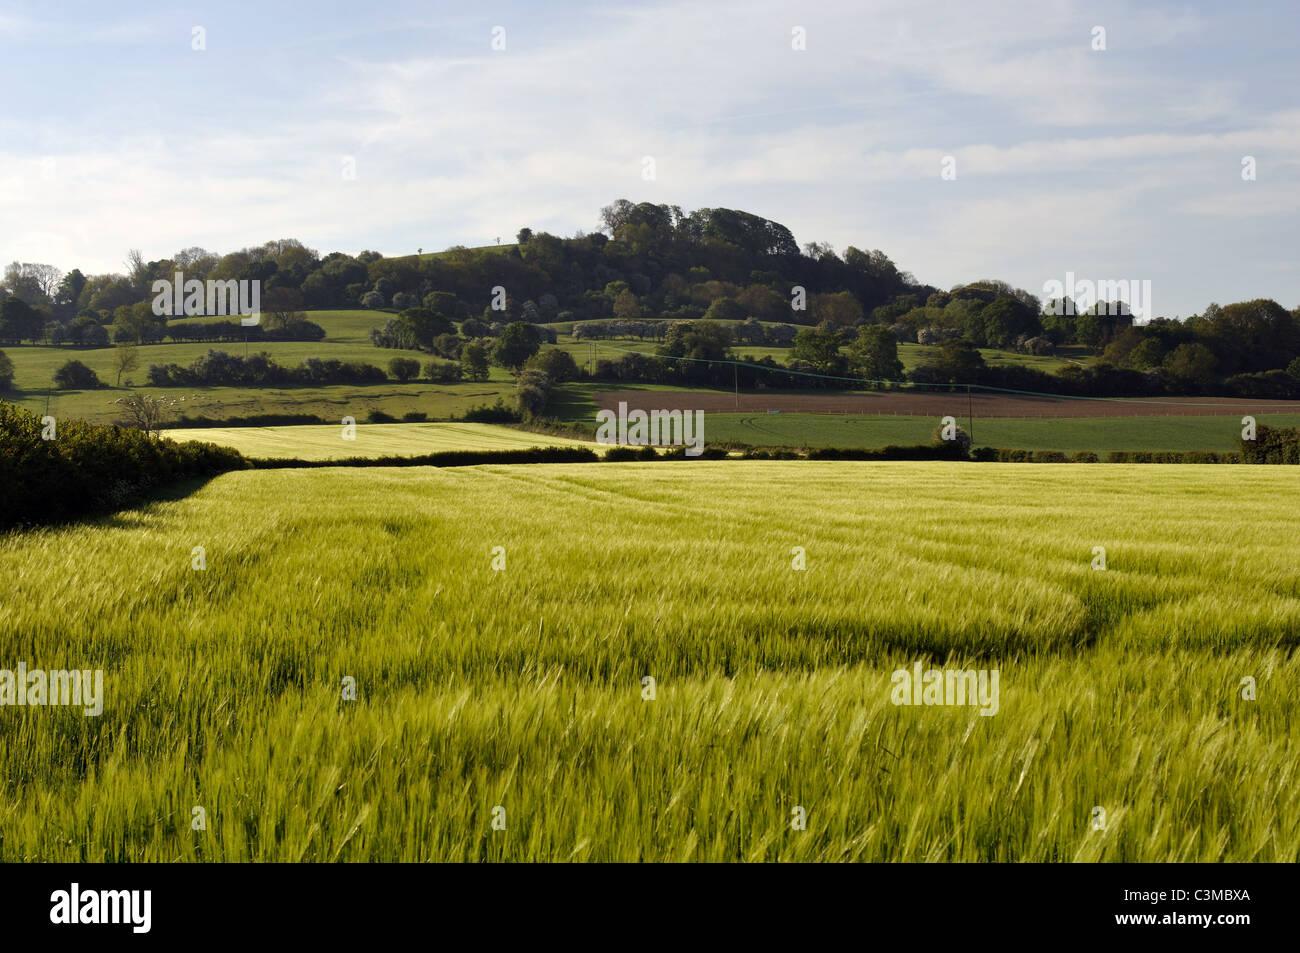 View towards Meon Hill, Warwickshire, England, UK - Stock Image